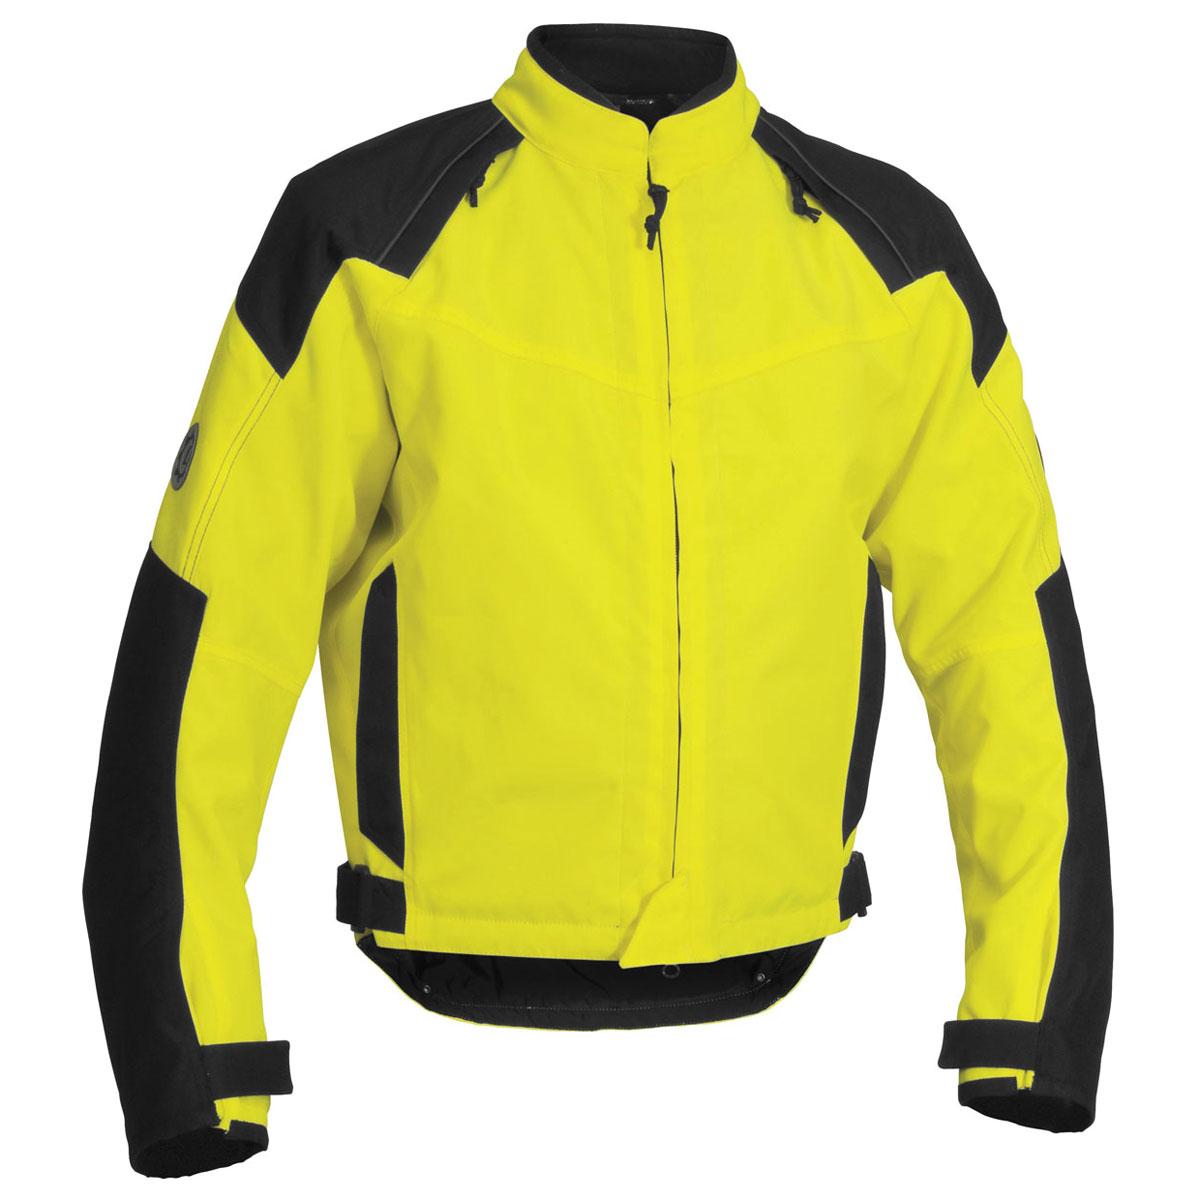 Firstgear Men's Rush DayGlo Textile Jacket